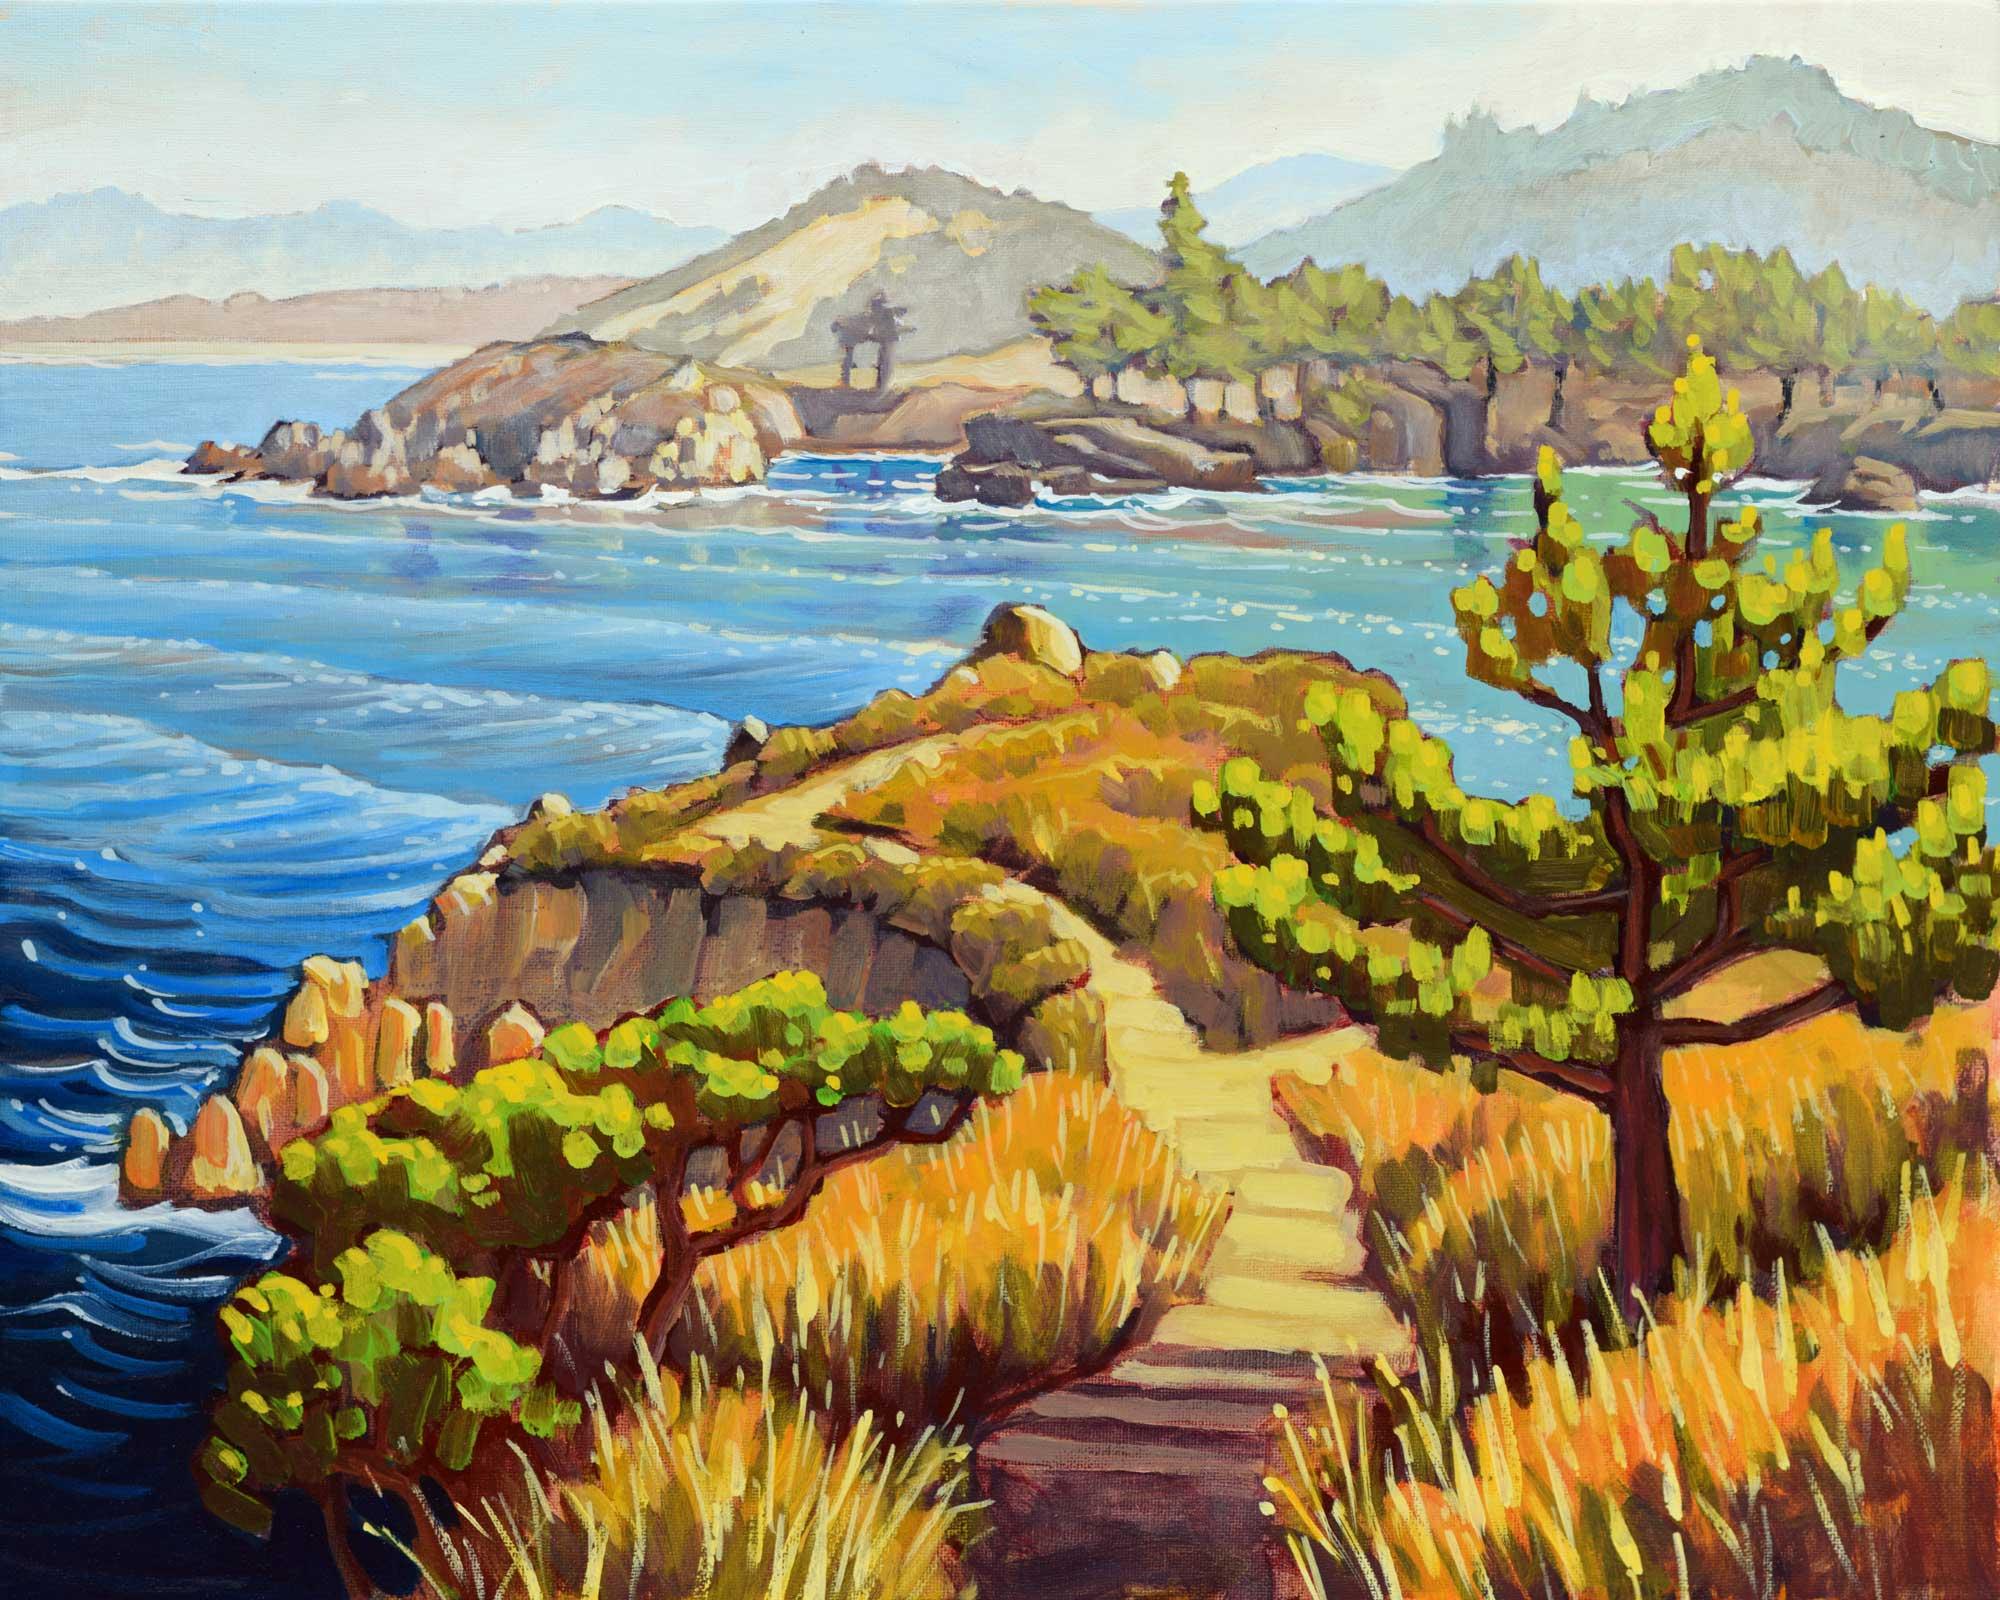 Plein air artwork from Point Lobos near Carmel on the Monterey coast of California